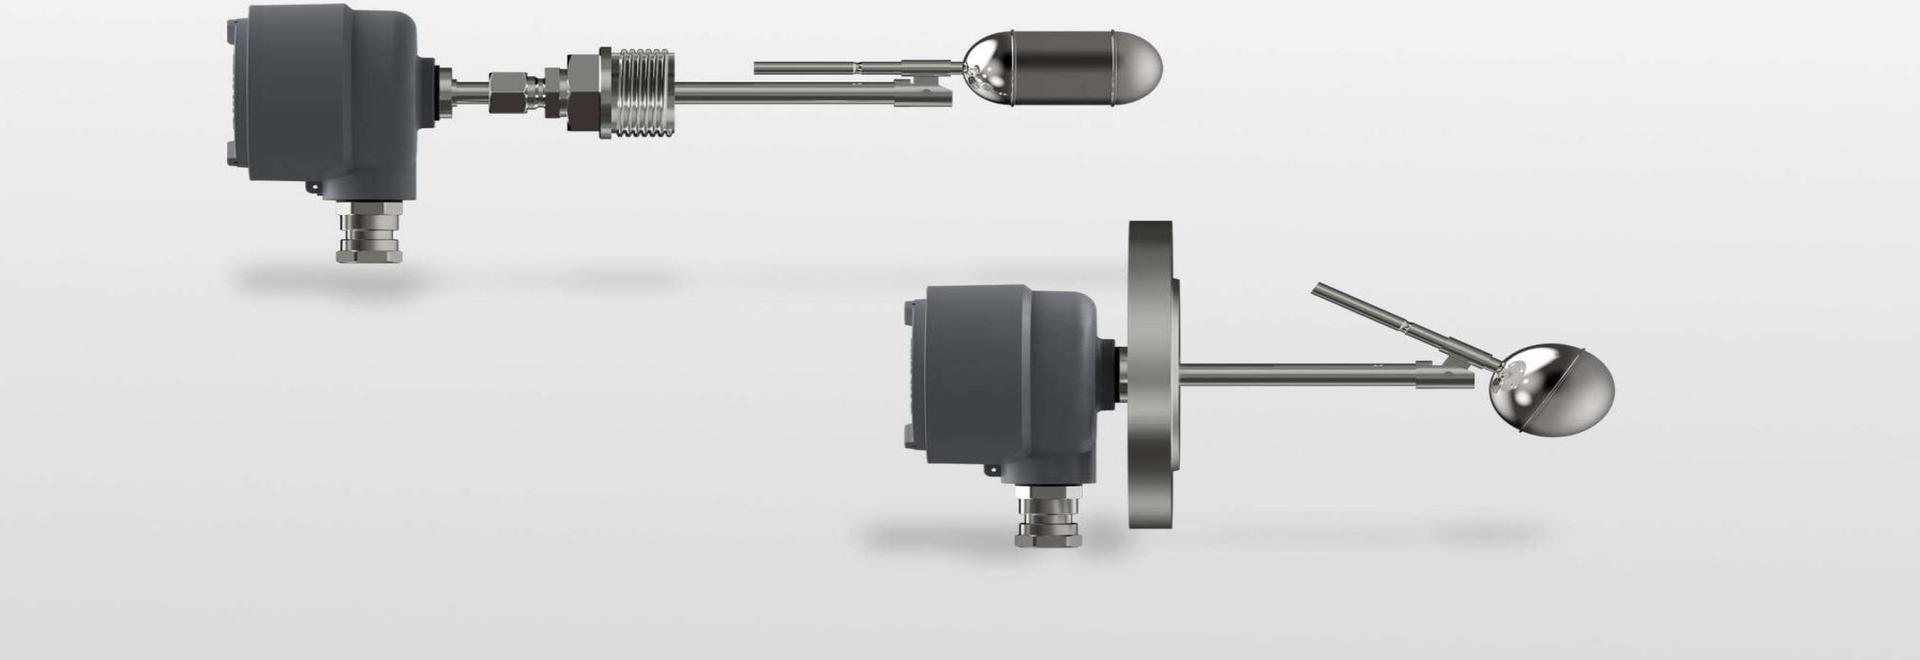 New JUMO Float Switch in Horizontal Design